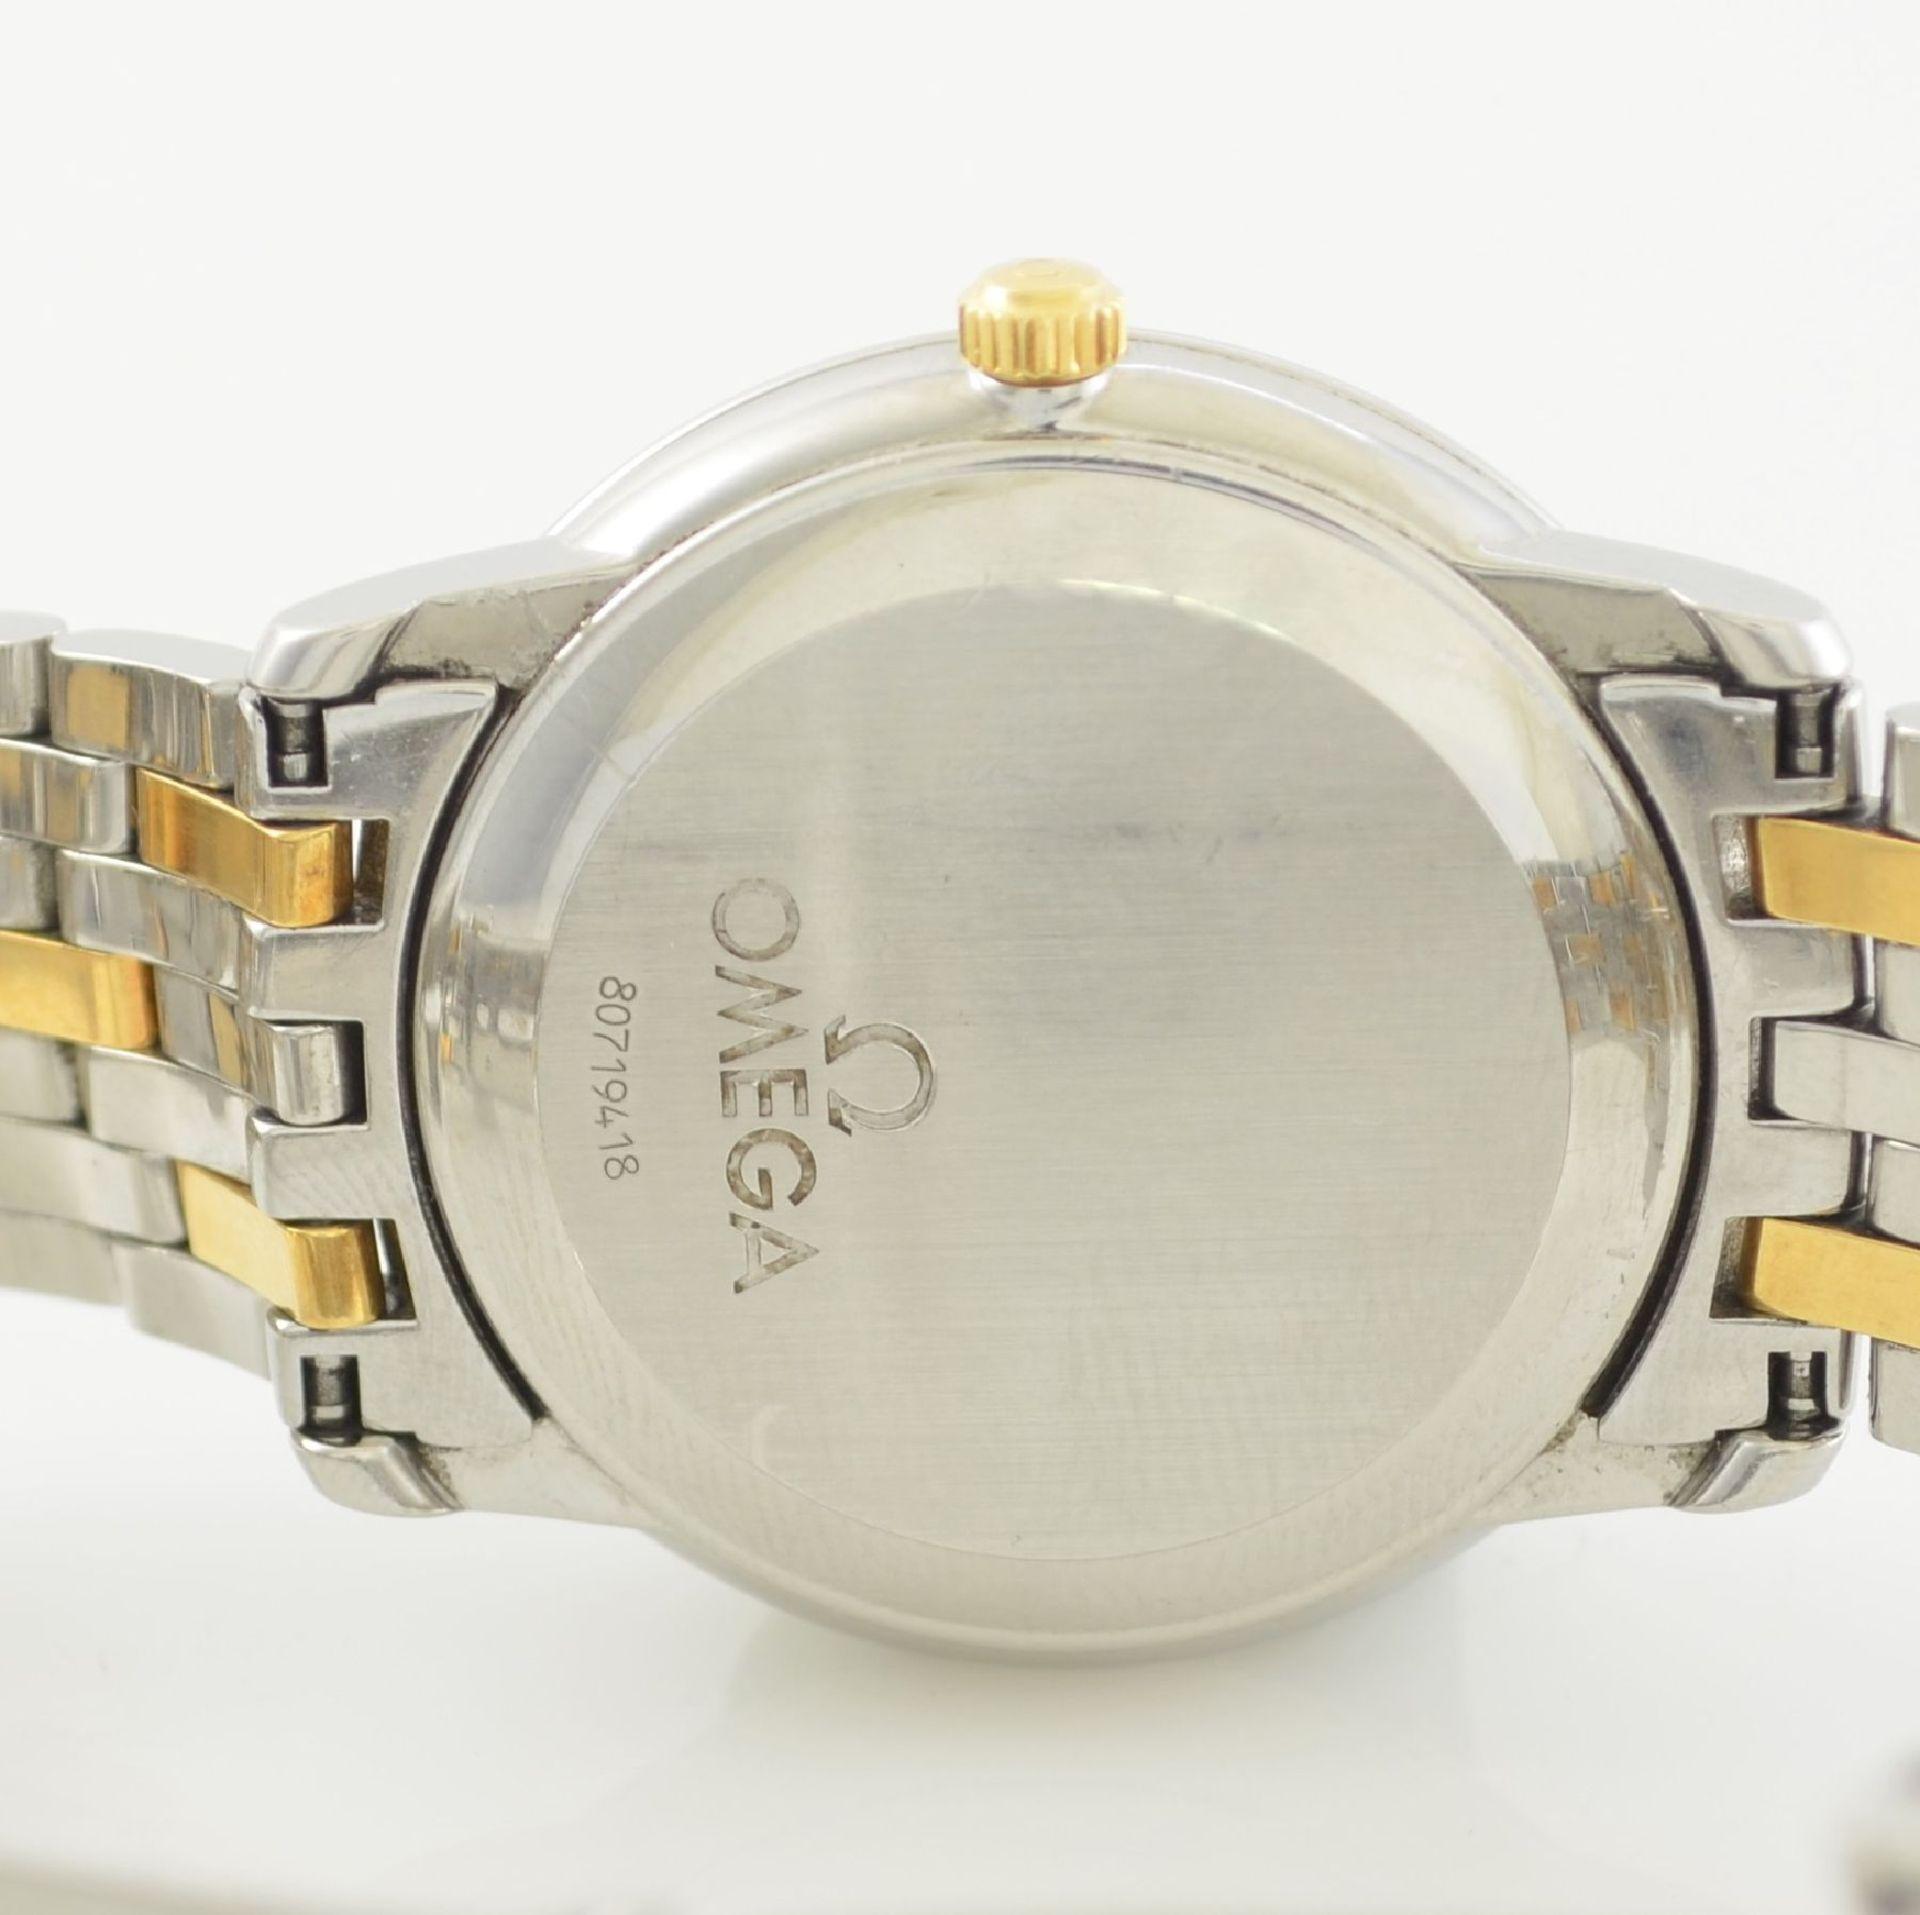 OMEGA Chronometer Herrenarmbanduhr in Edelstahl/Gold Ref. 168 1050, Schweiz um 2006, Automatik, - Bild 7 aus 7